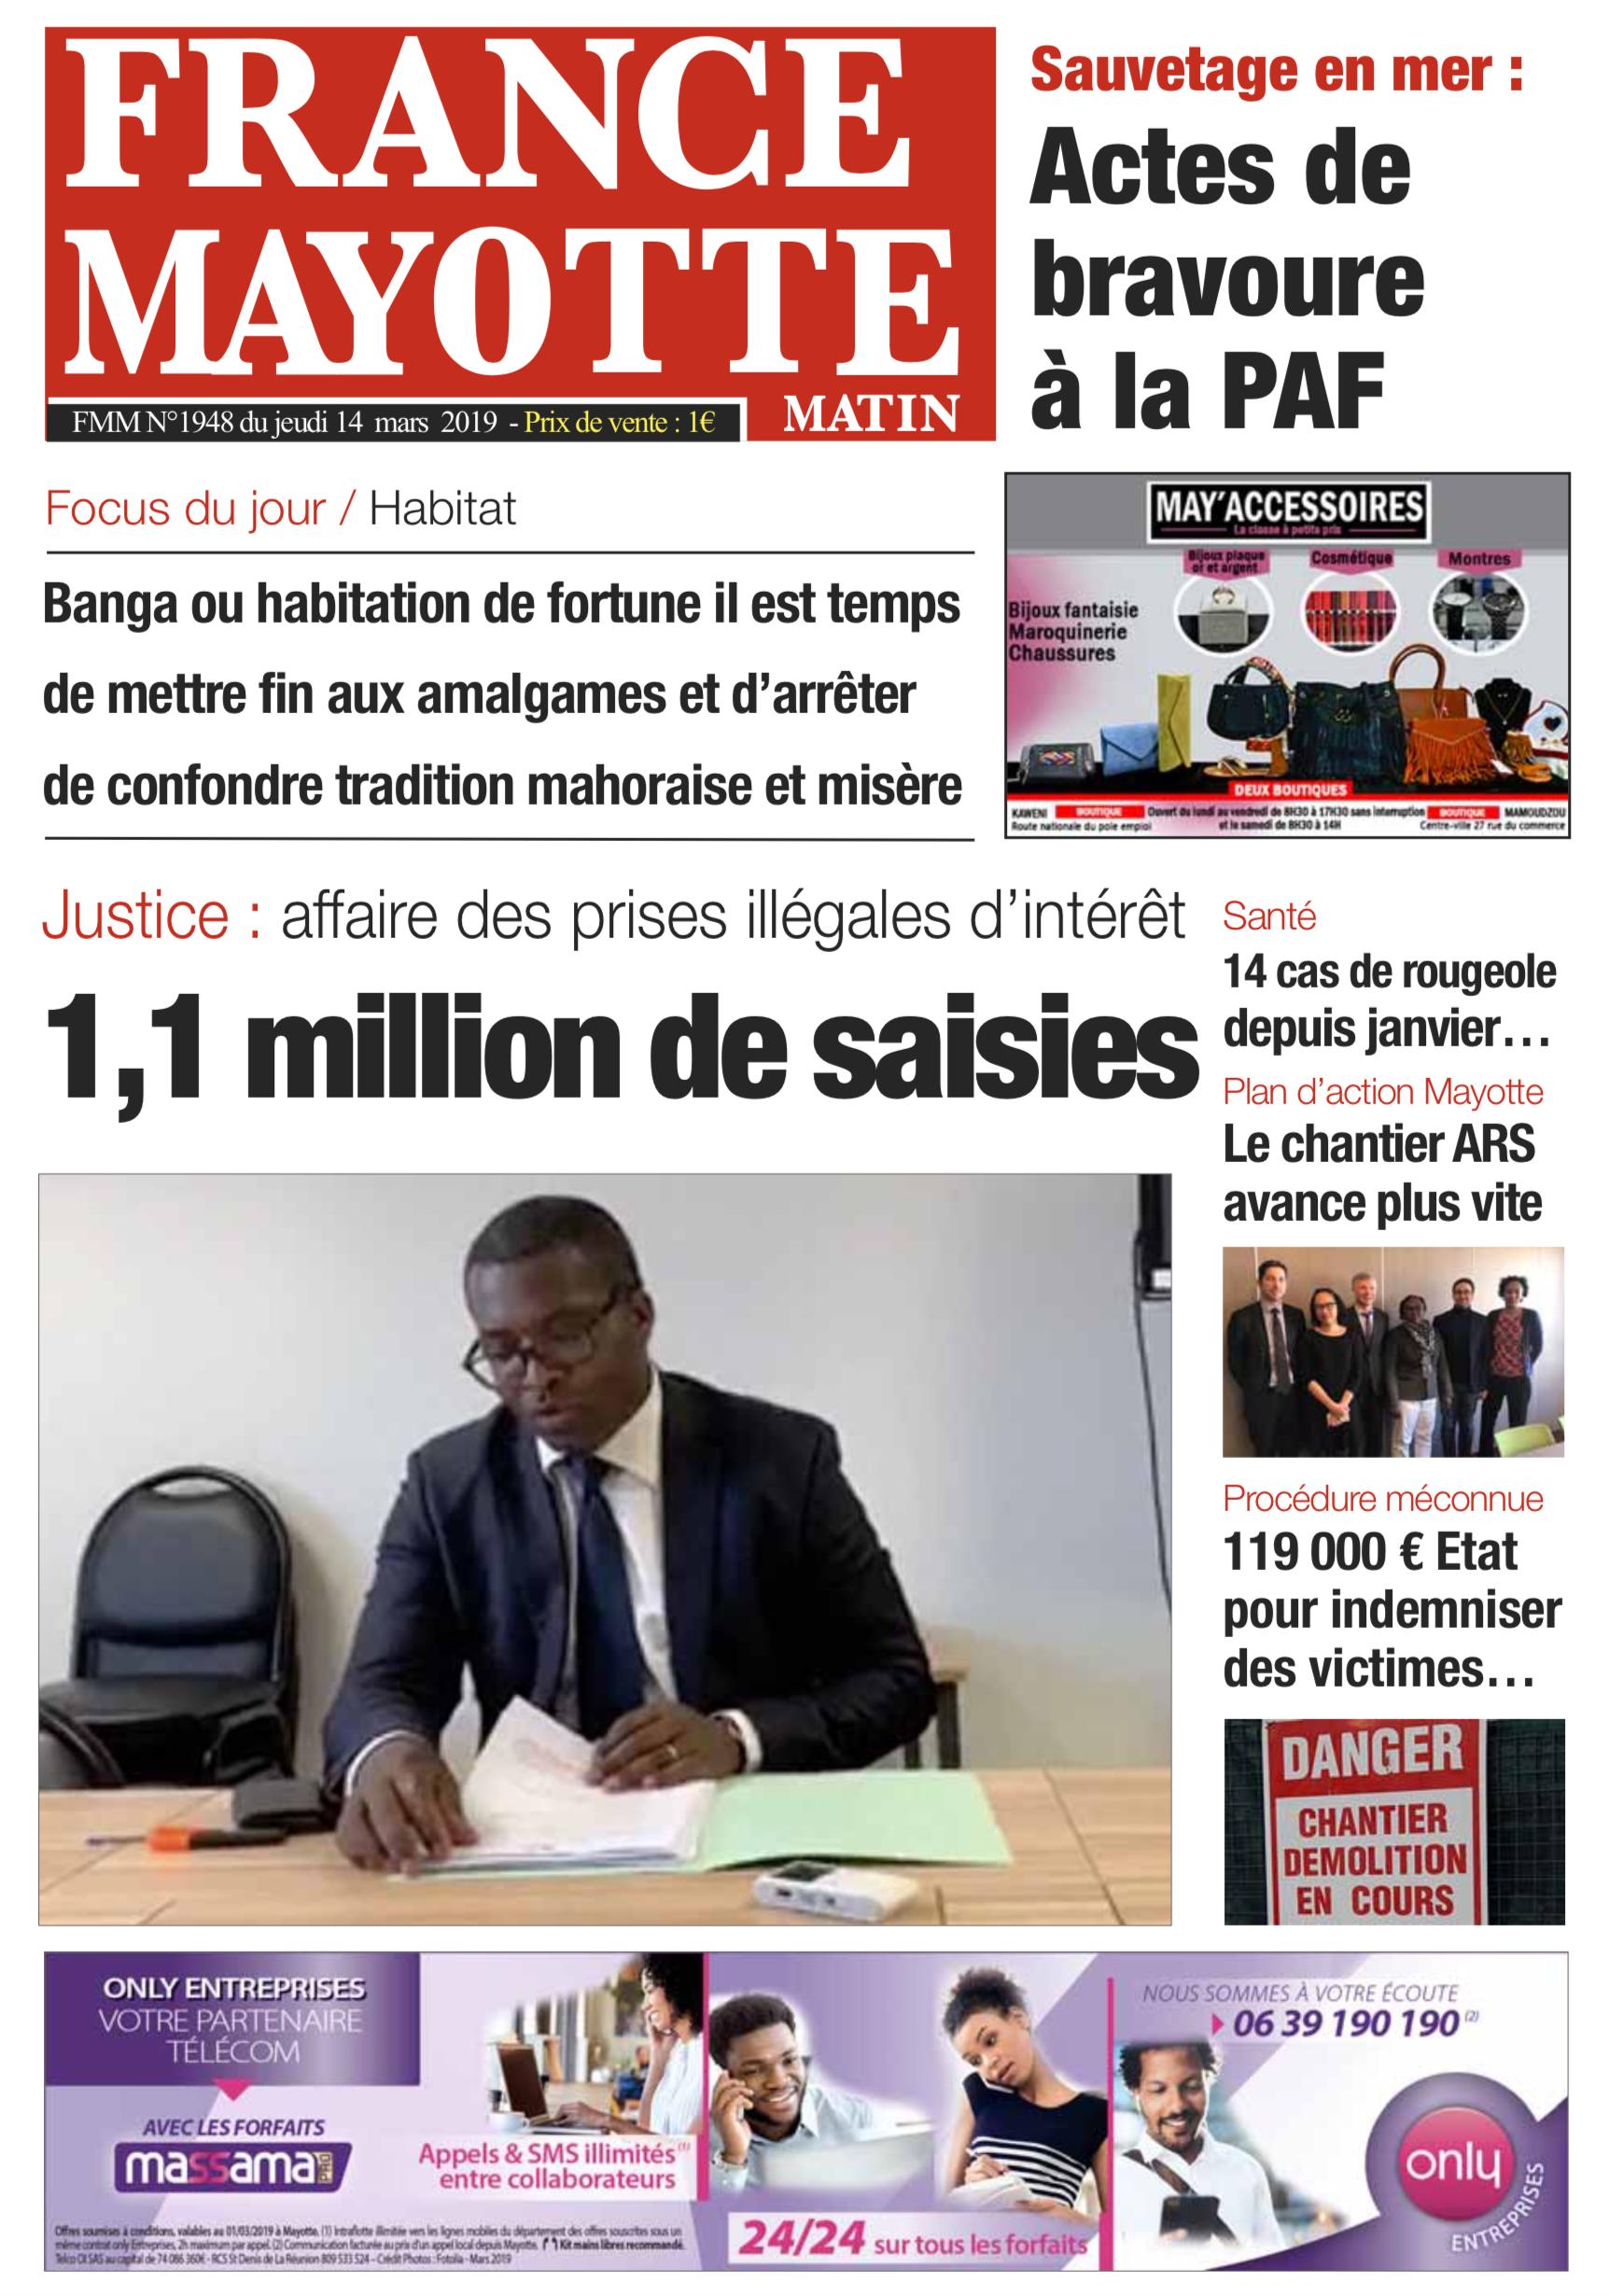 France Mayotte Jeudi 14 mars 2019